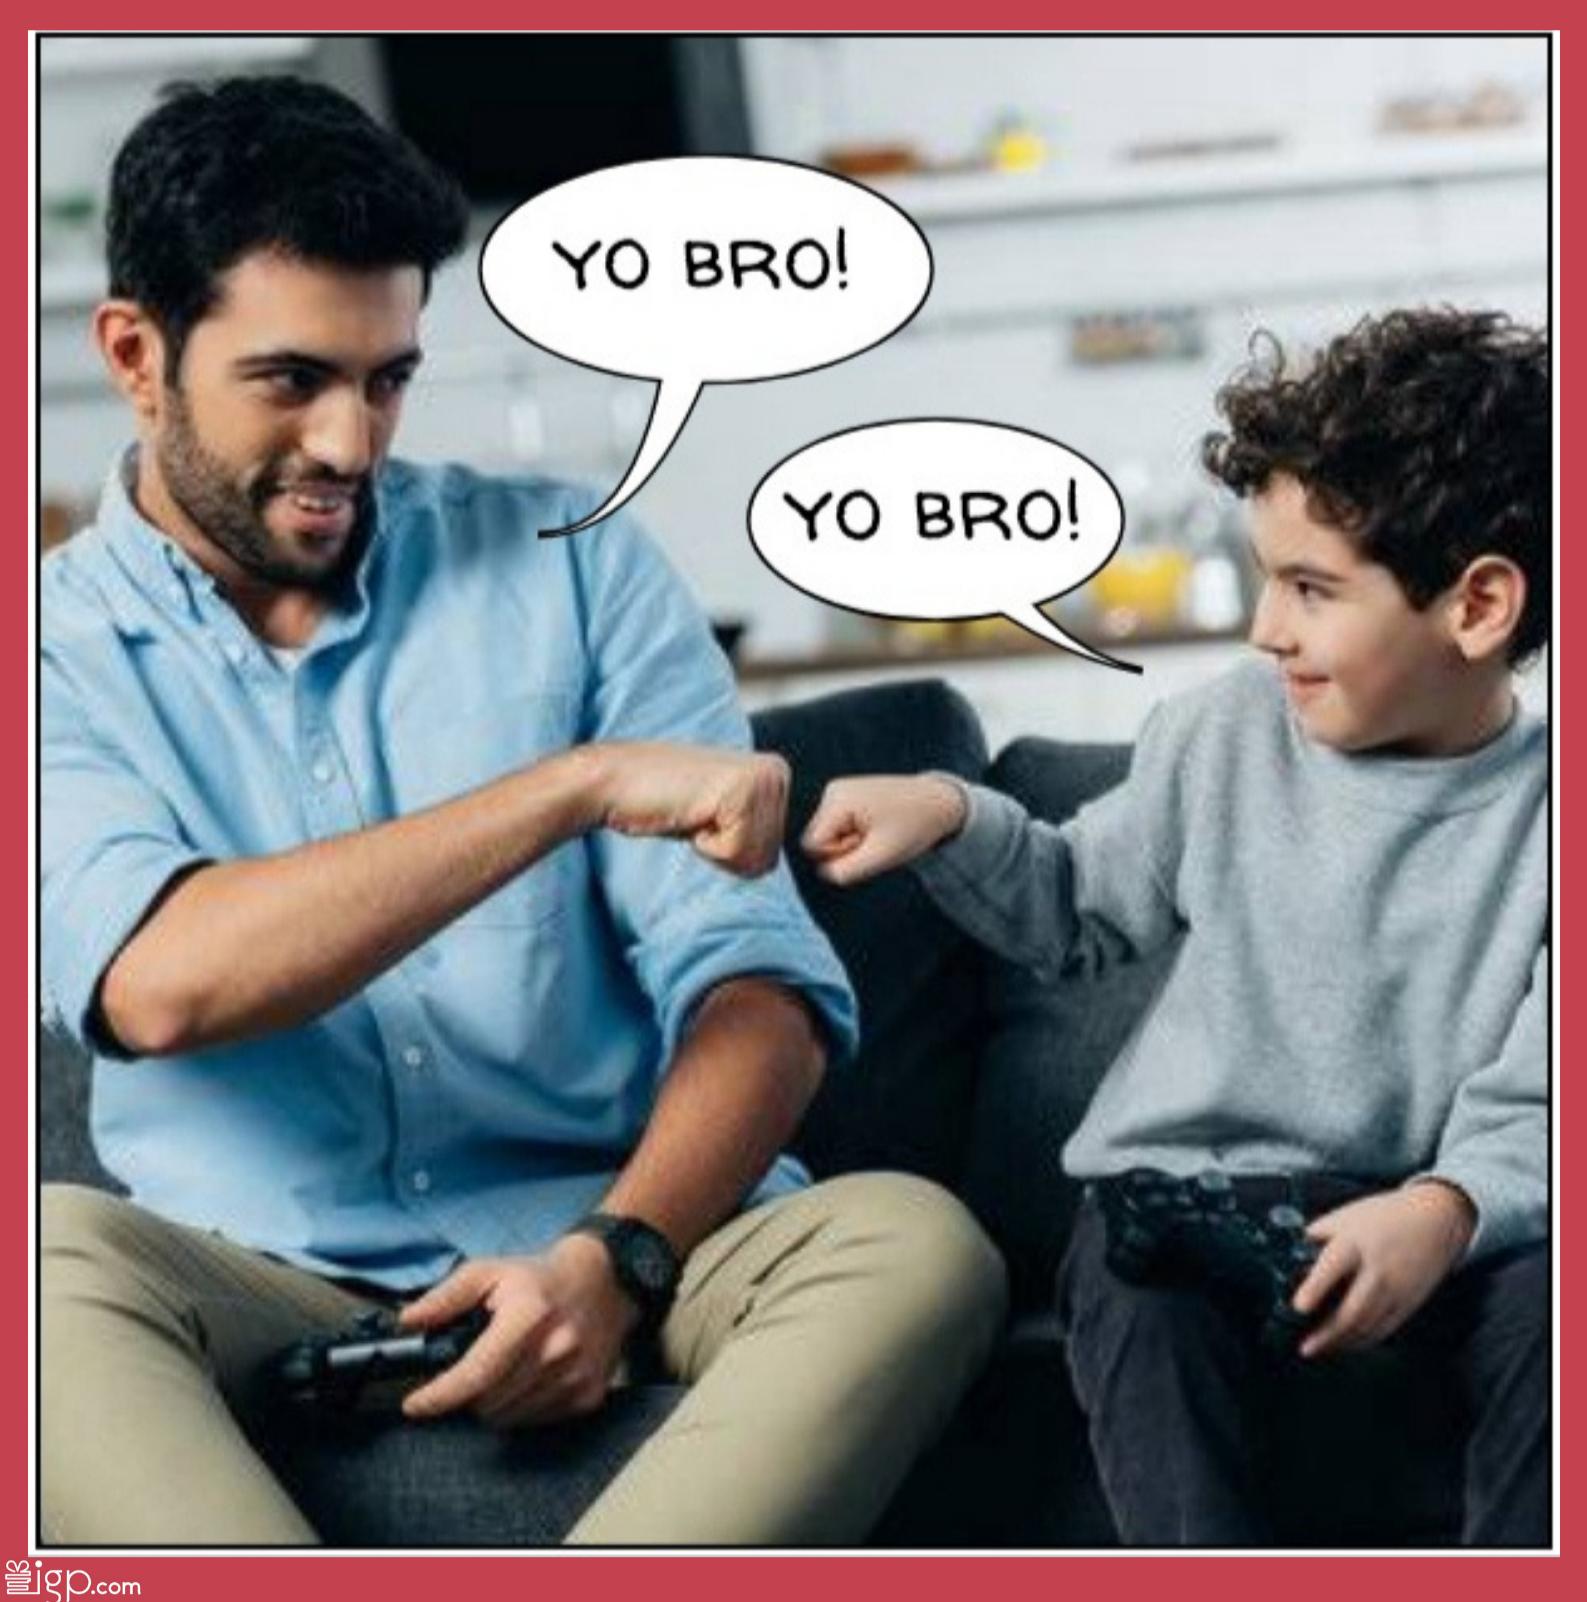 Dad fist bumping son